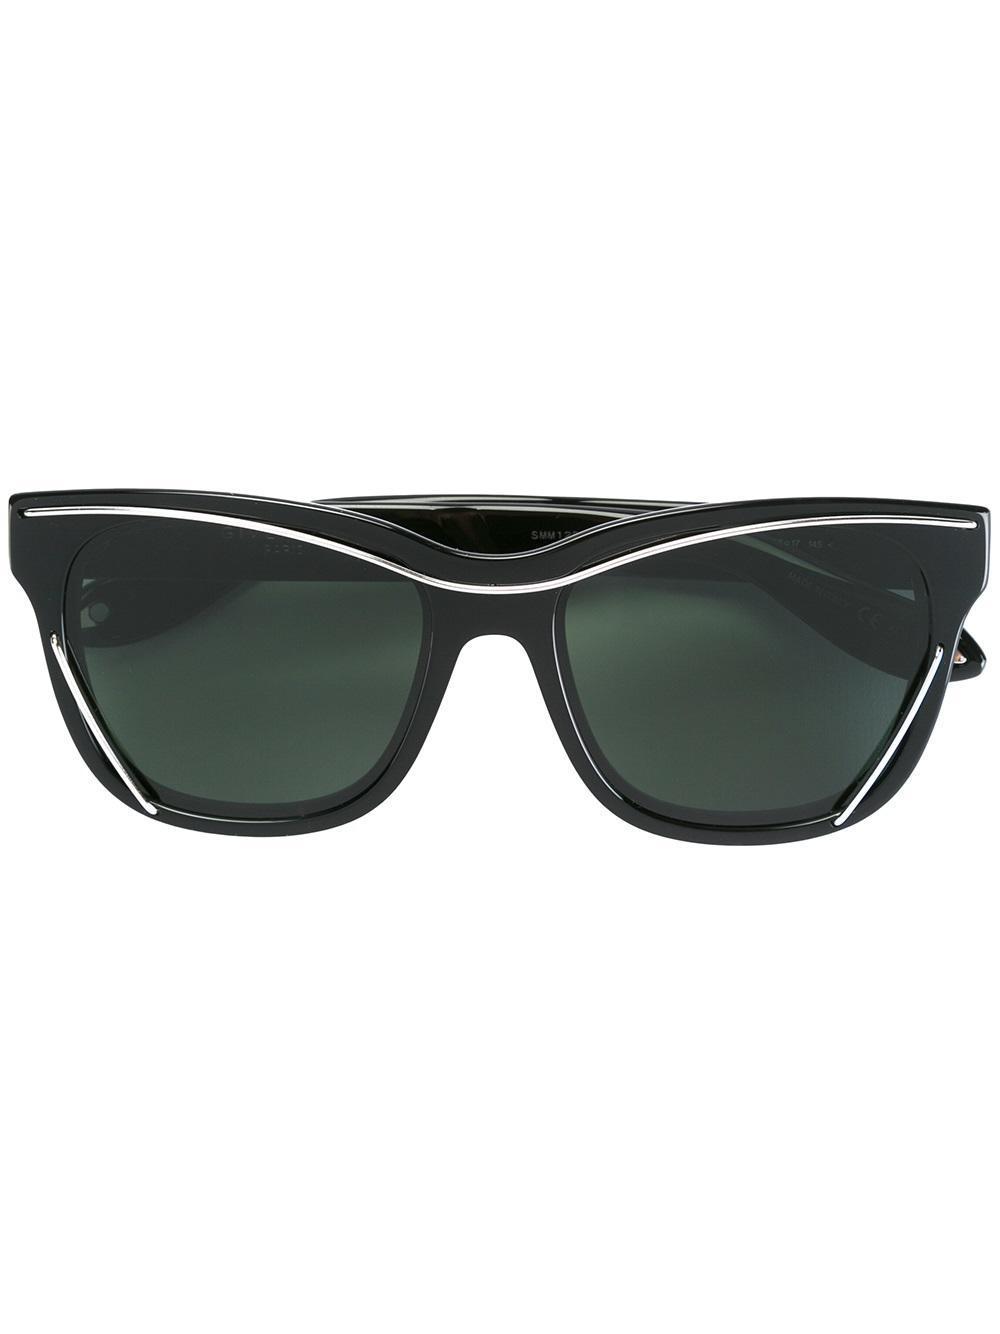 new lifestyle new list 50% off Givenchy Sunglasses 2018 Uk | CINEMAS 93